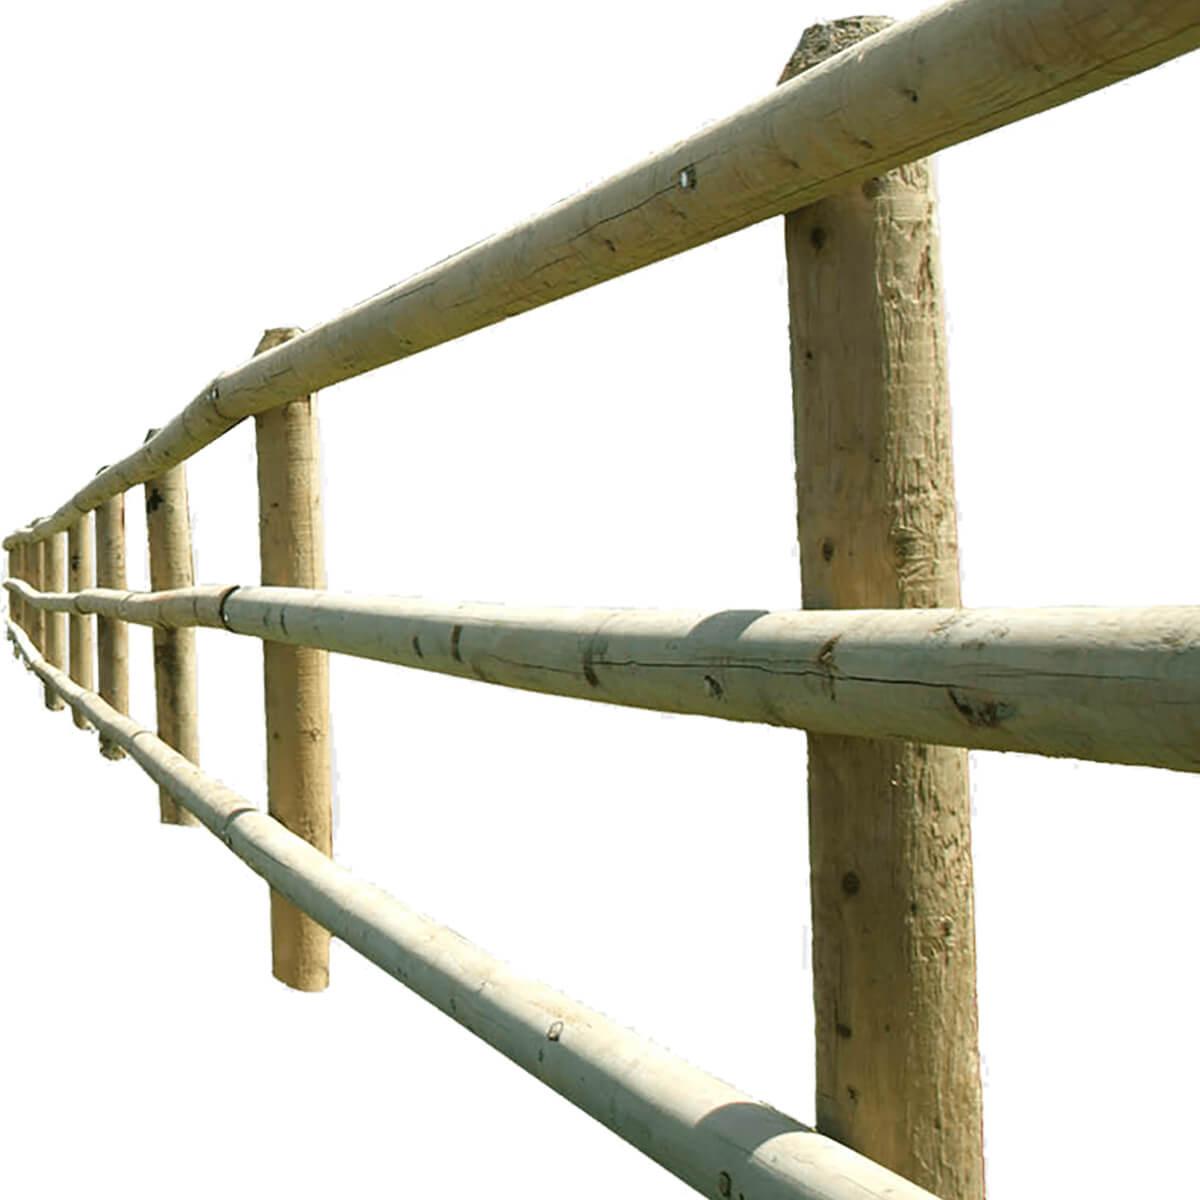 Dowelled Rail - Blunt - 4.25-in x 16-ft